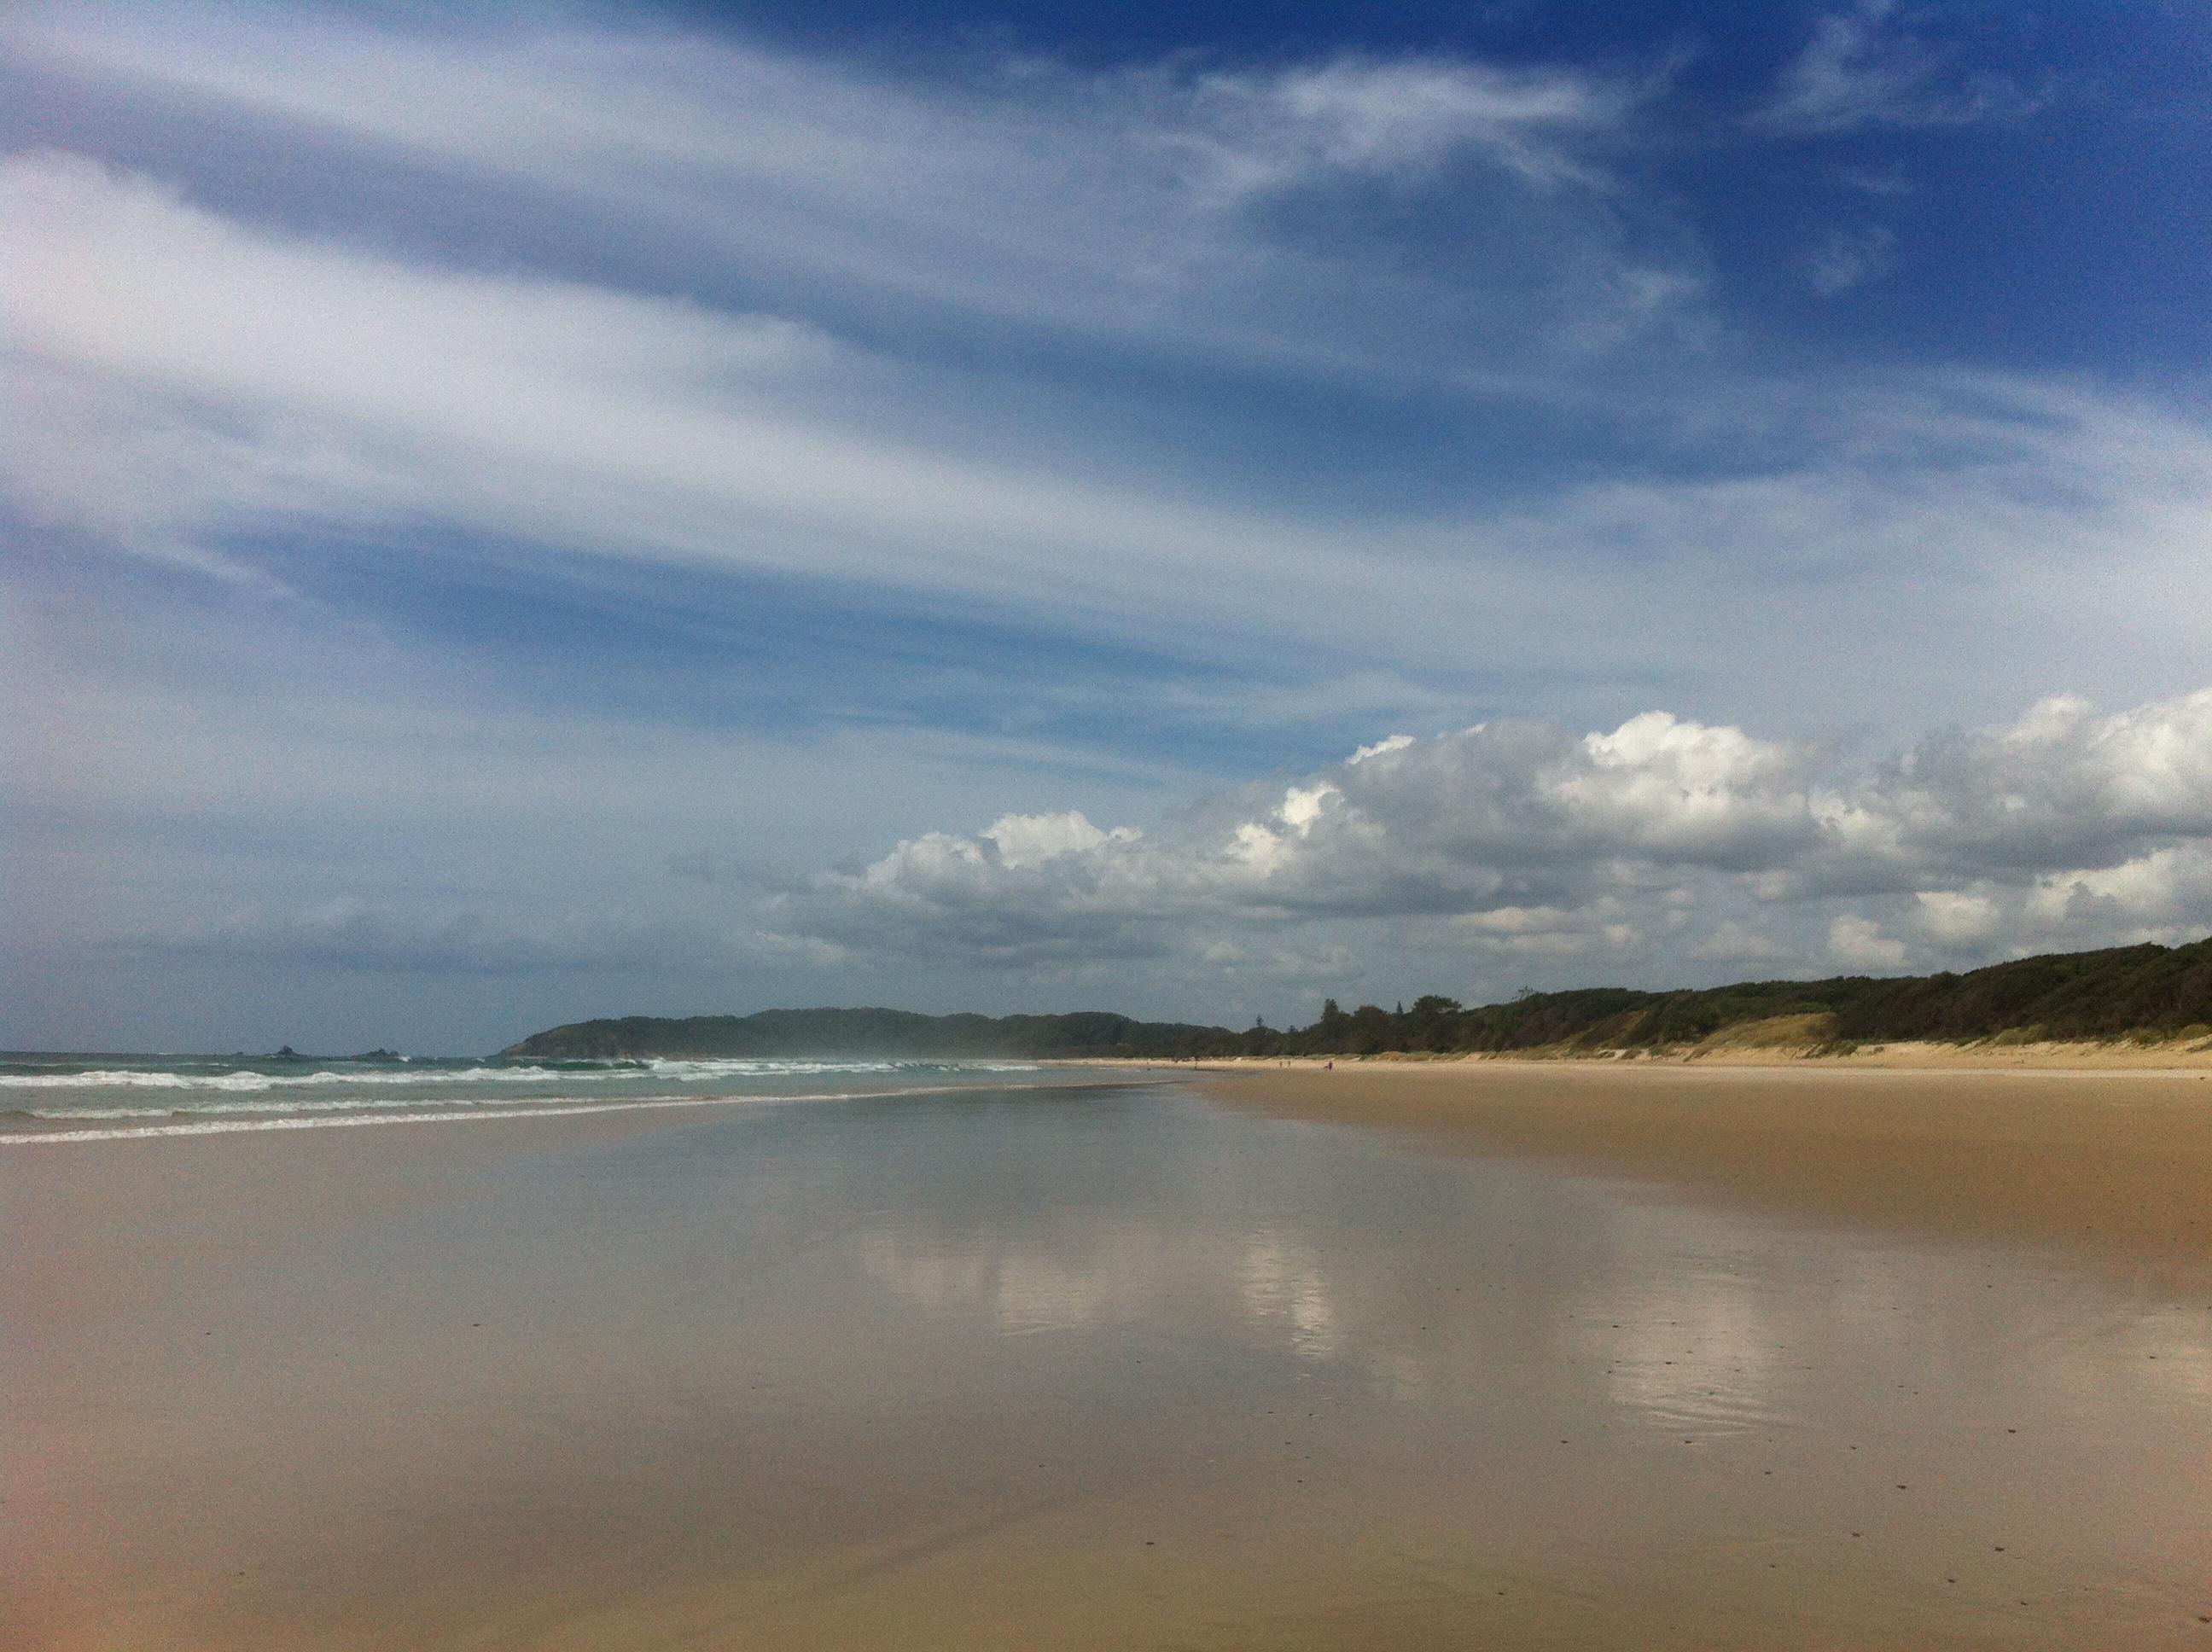 Linn-Dubh - Byron Bay - Australia - Reisepläne 2017